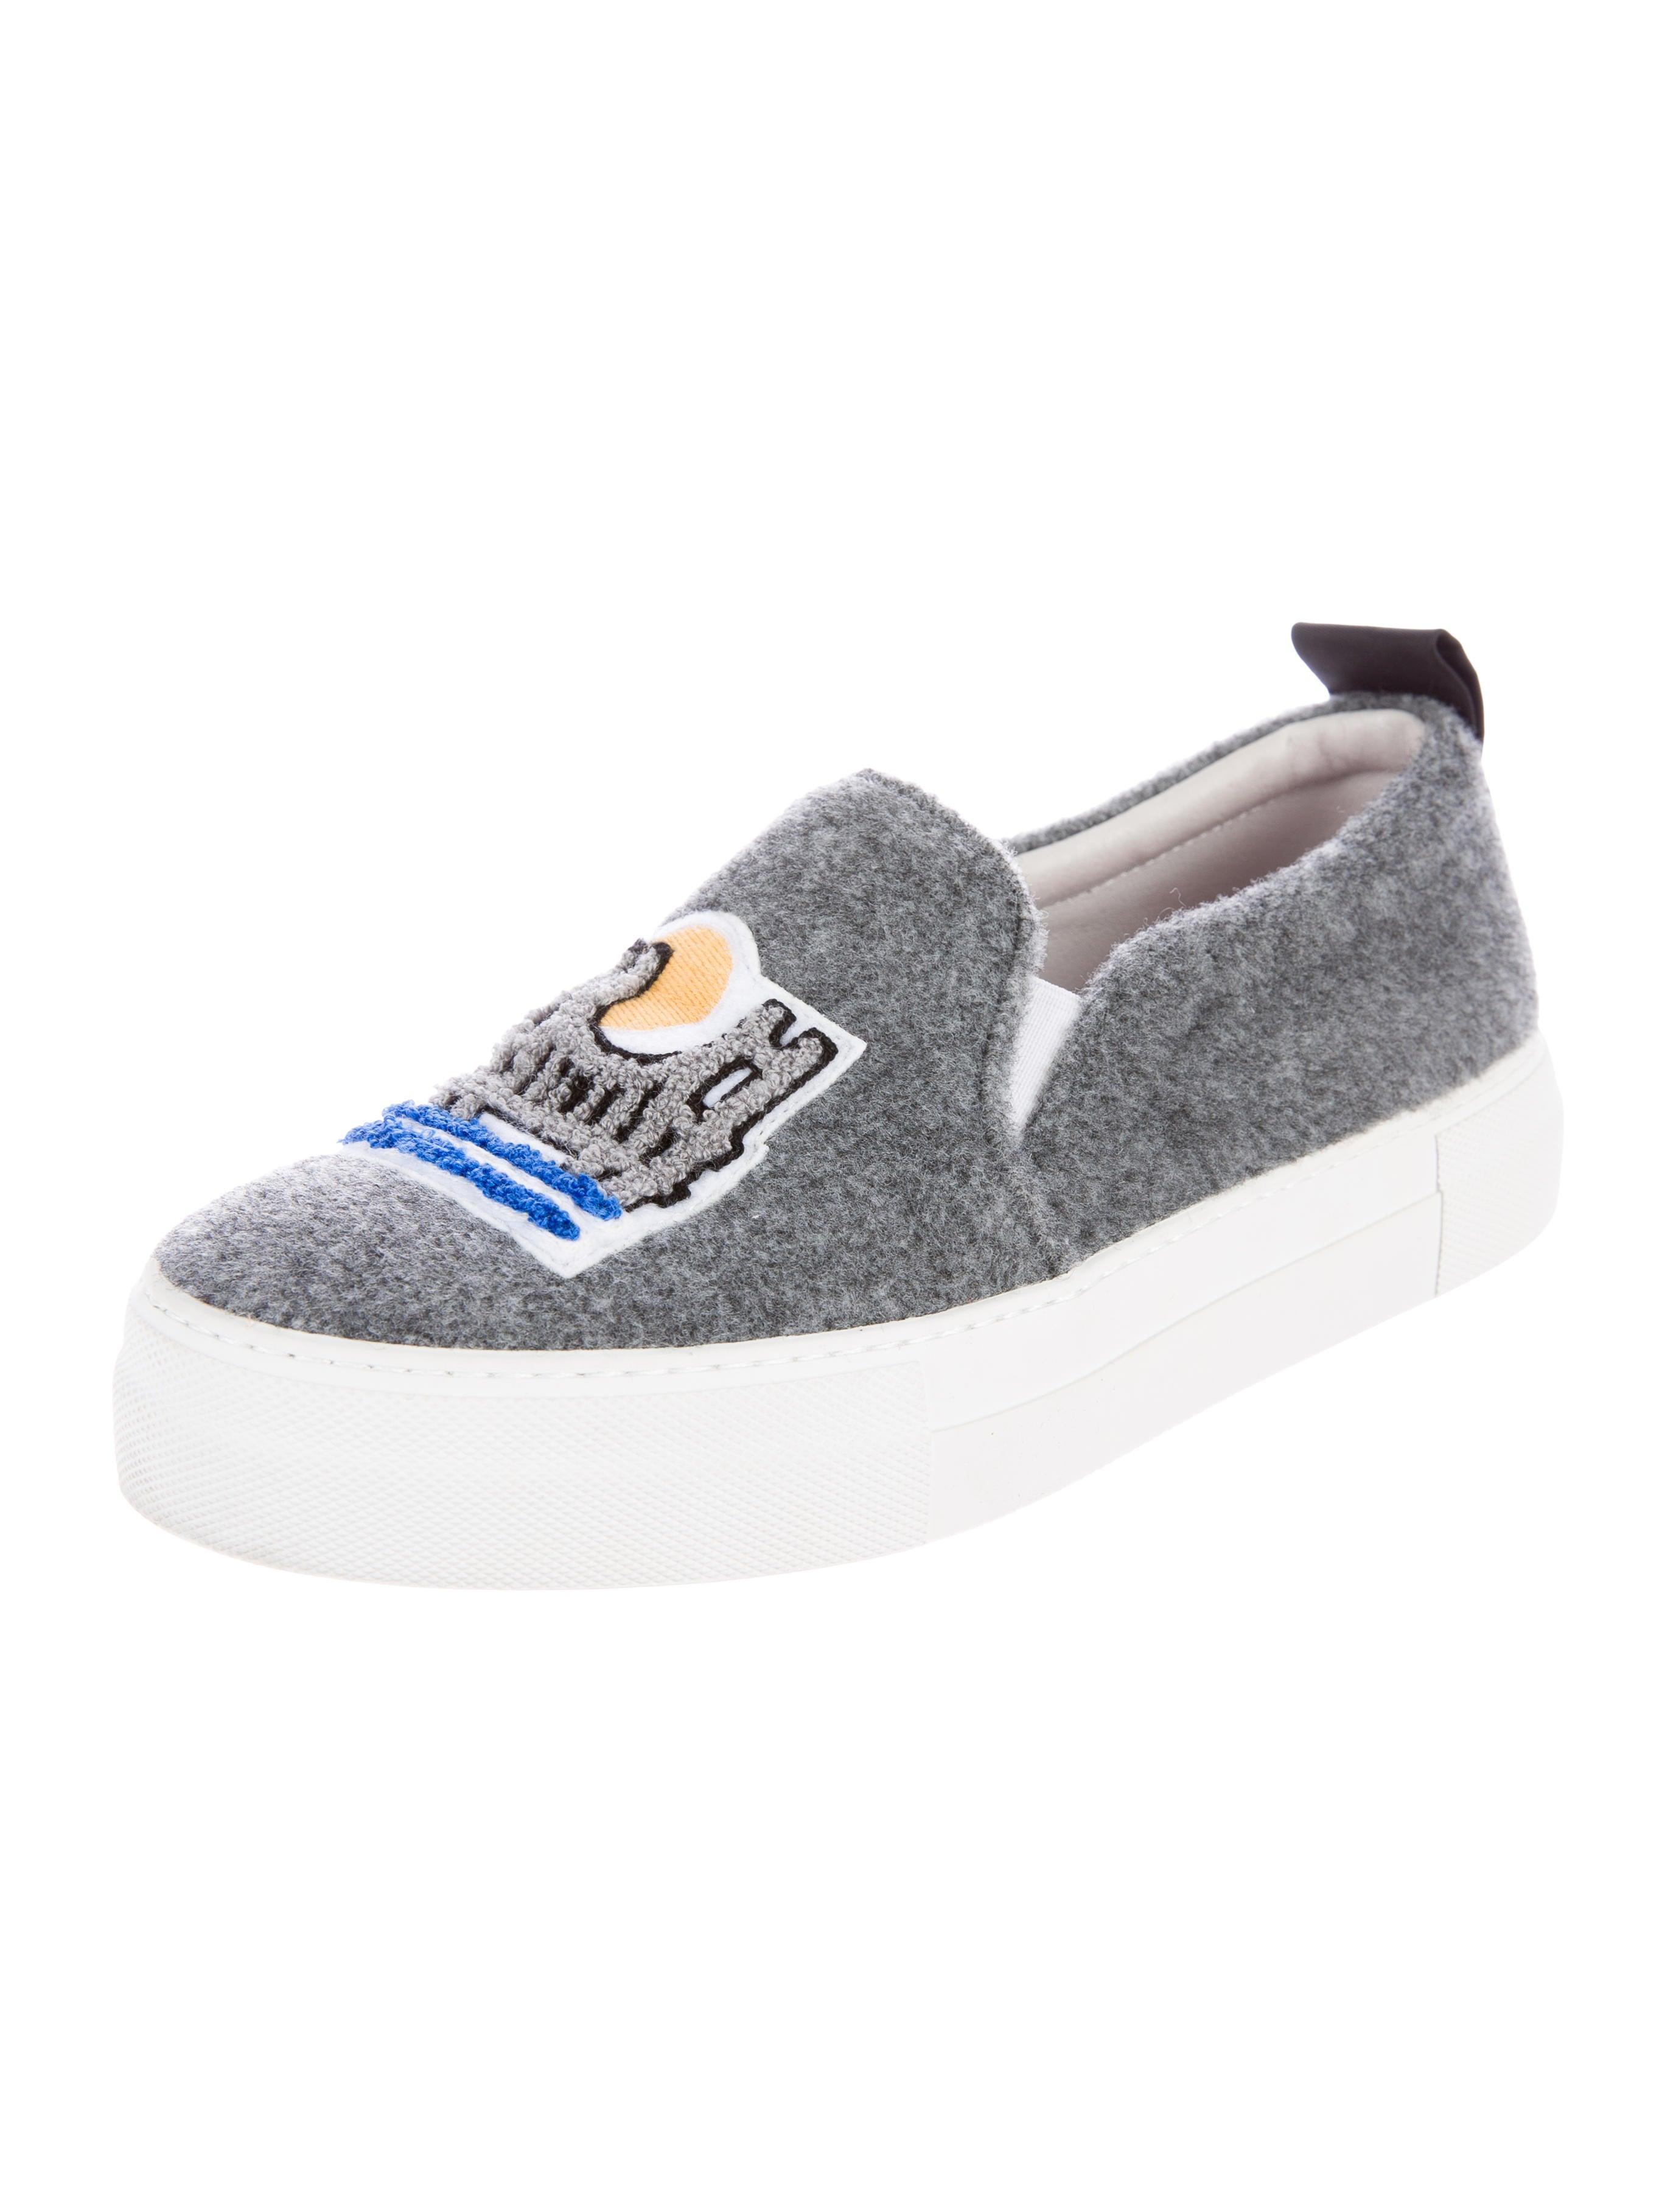 Joshua Sanders Slip-On Platform Sneakers - Shoes - WSNDR20028 | The RealReal